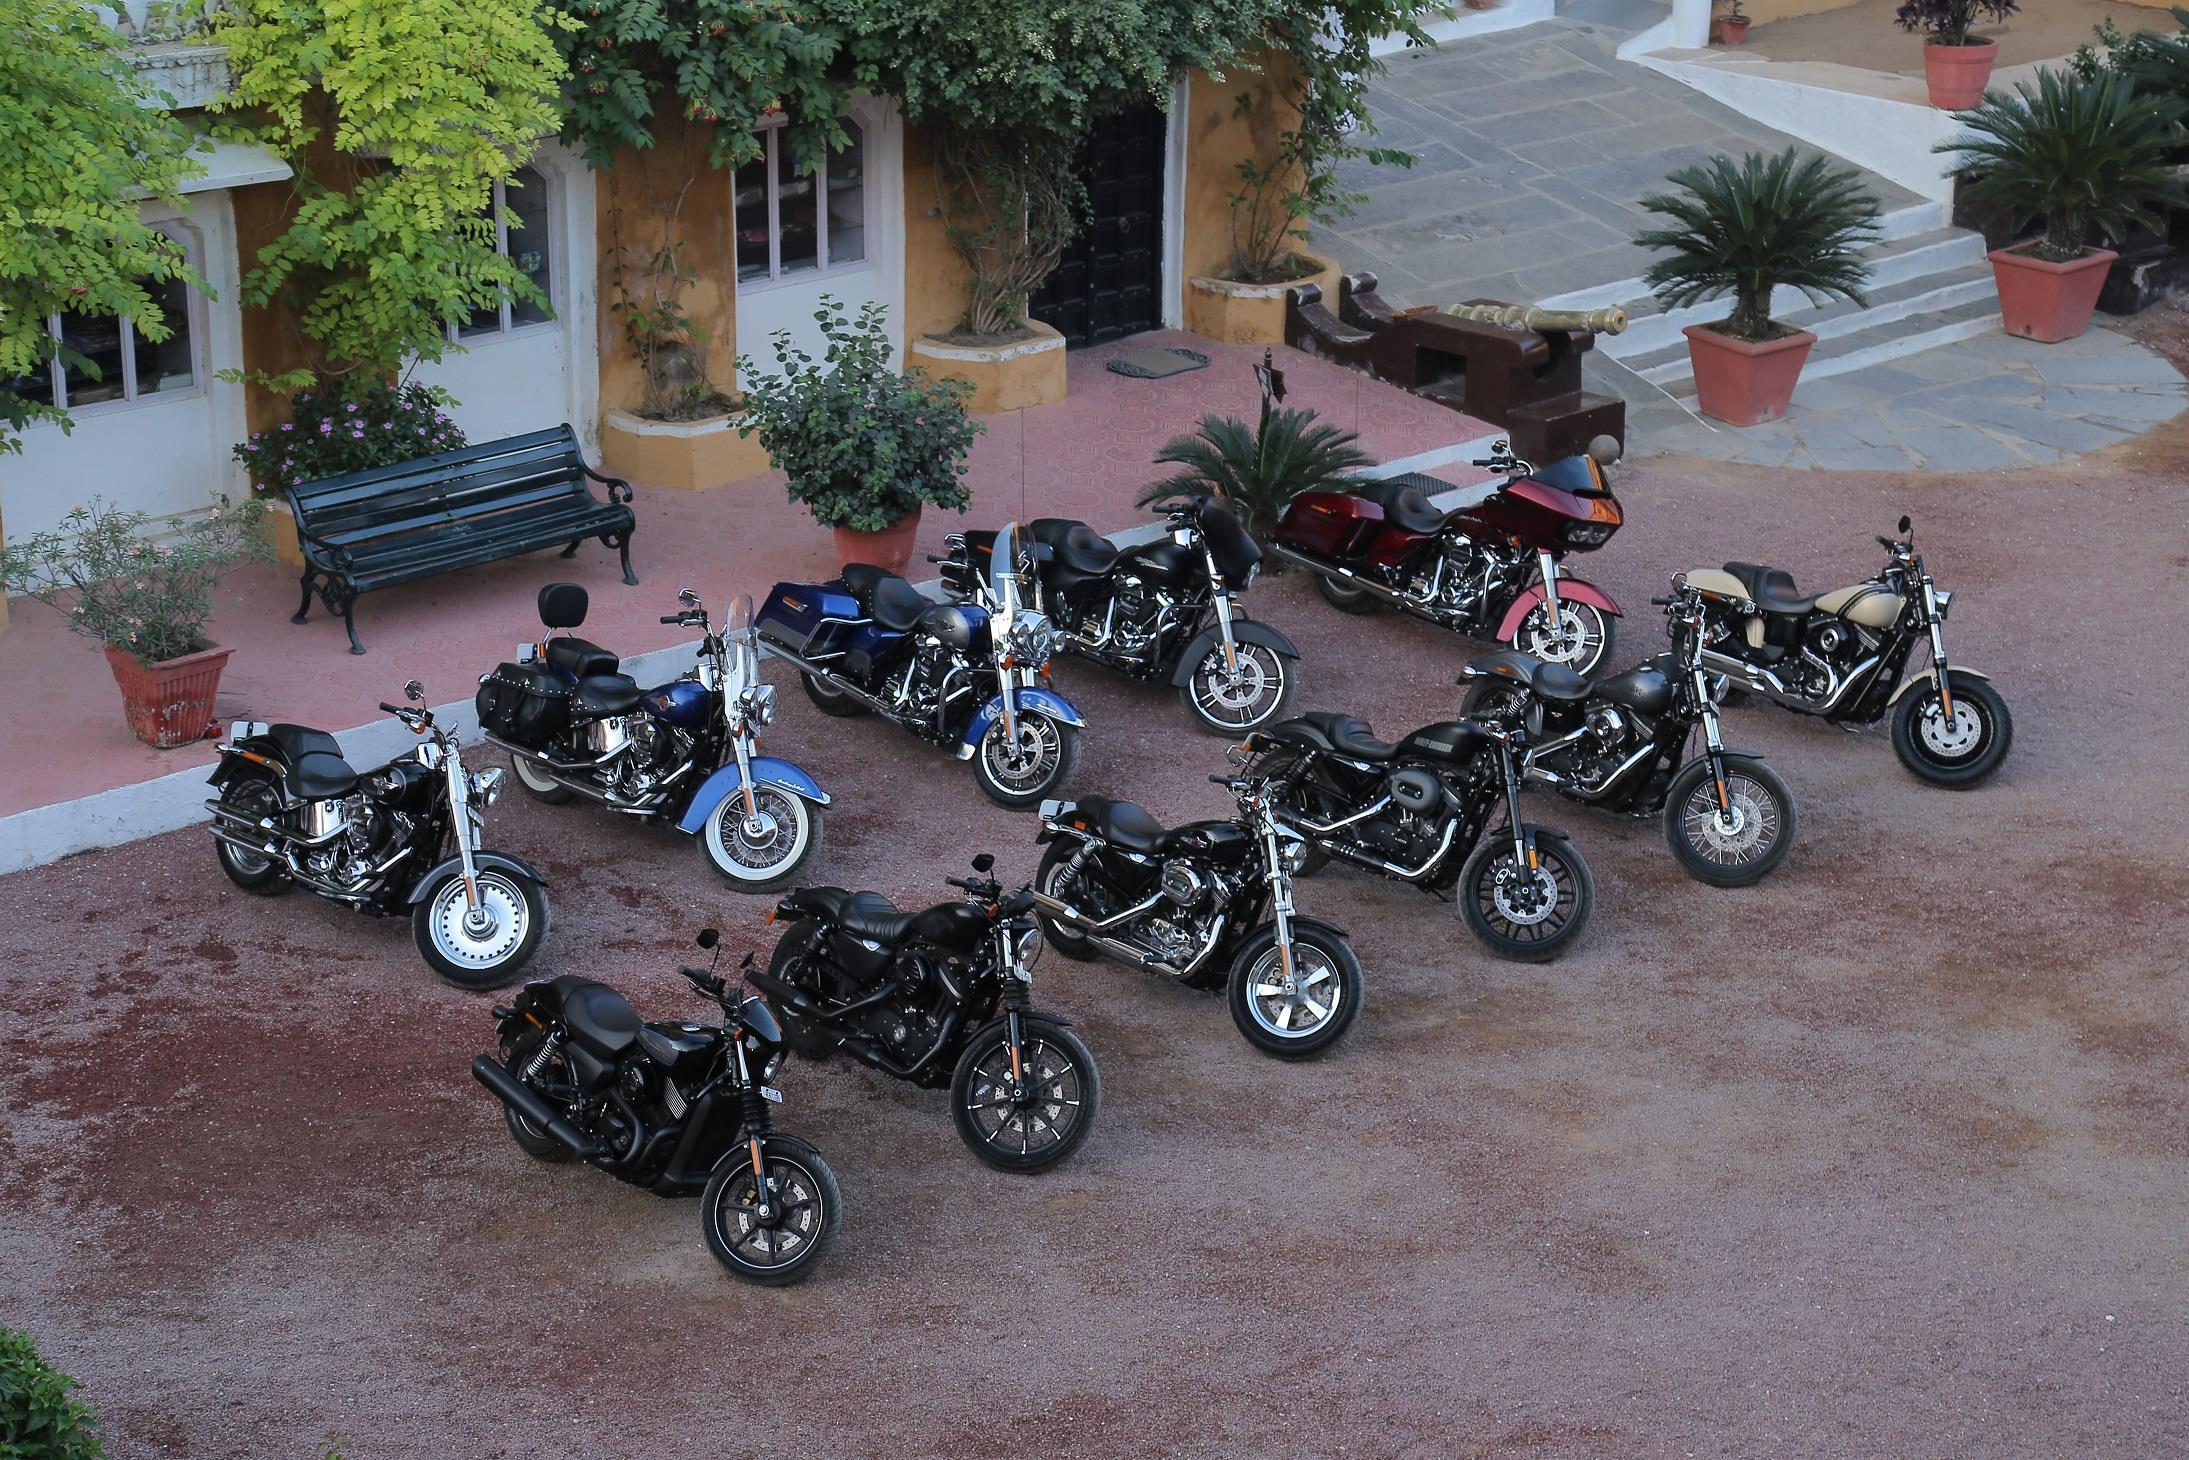 Harley-Davidson Passport to Freedom returns